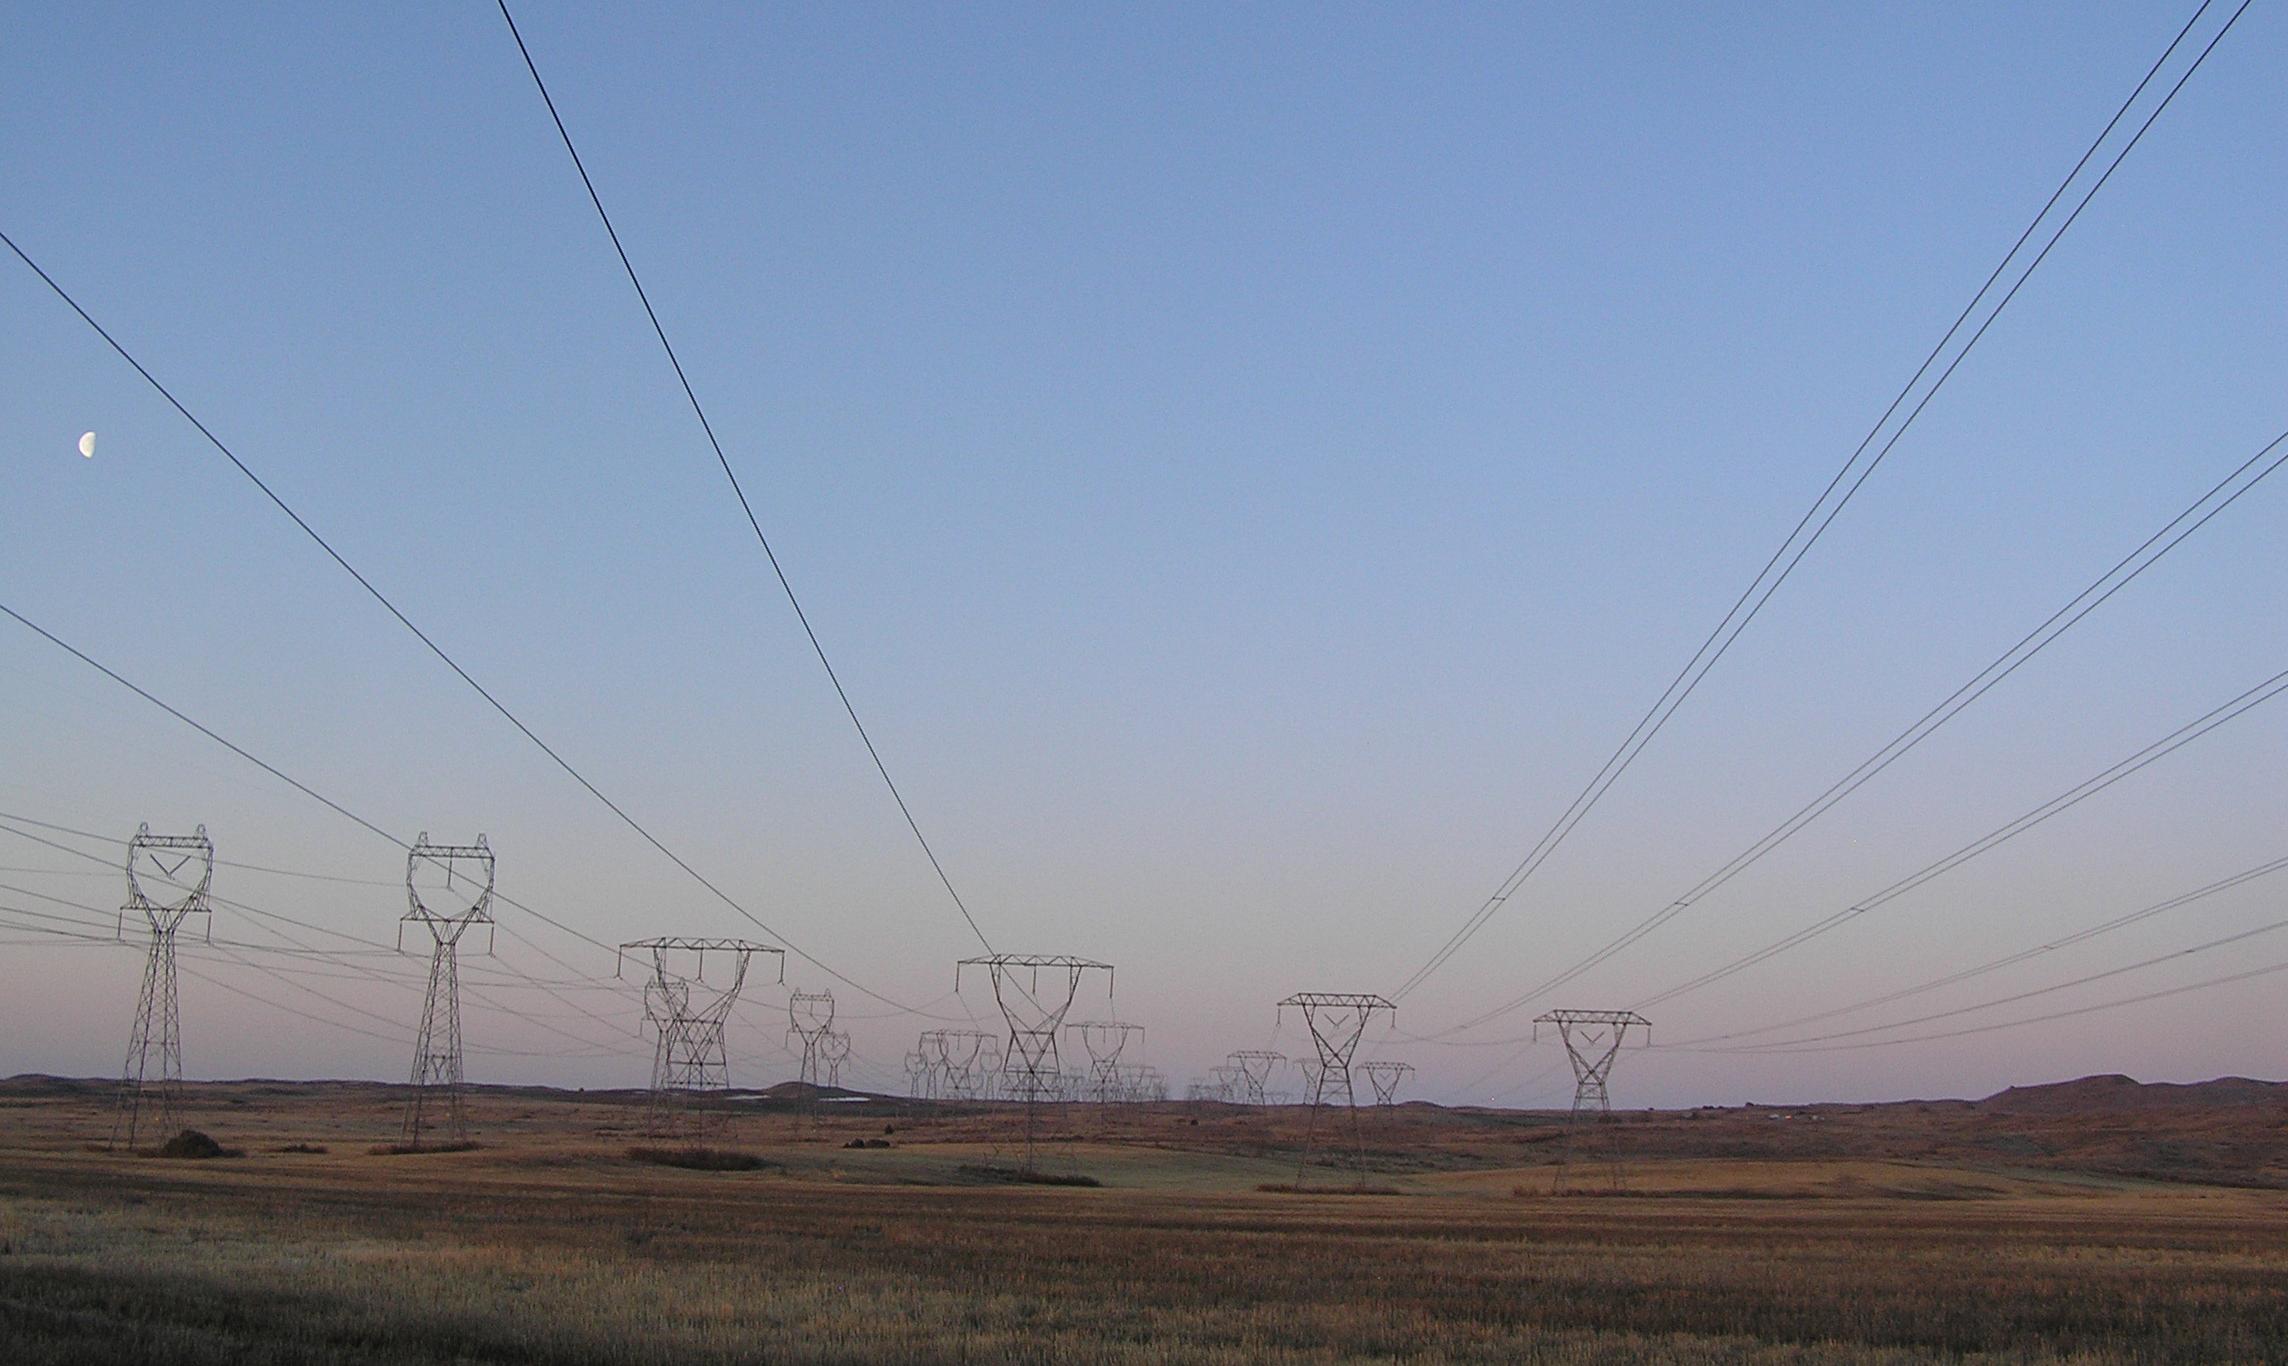 Impact of birds on power lines 29